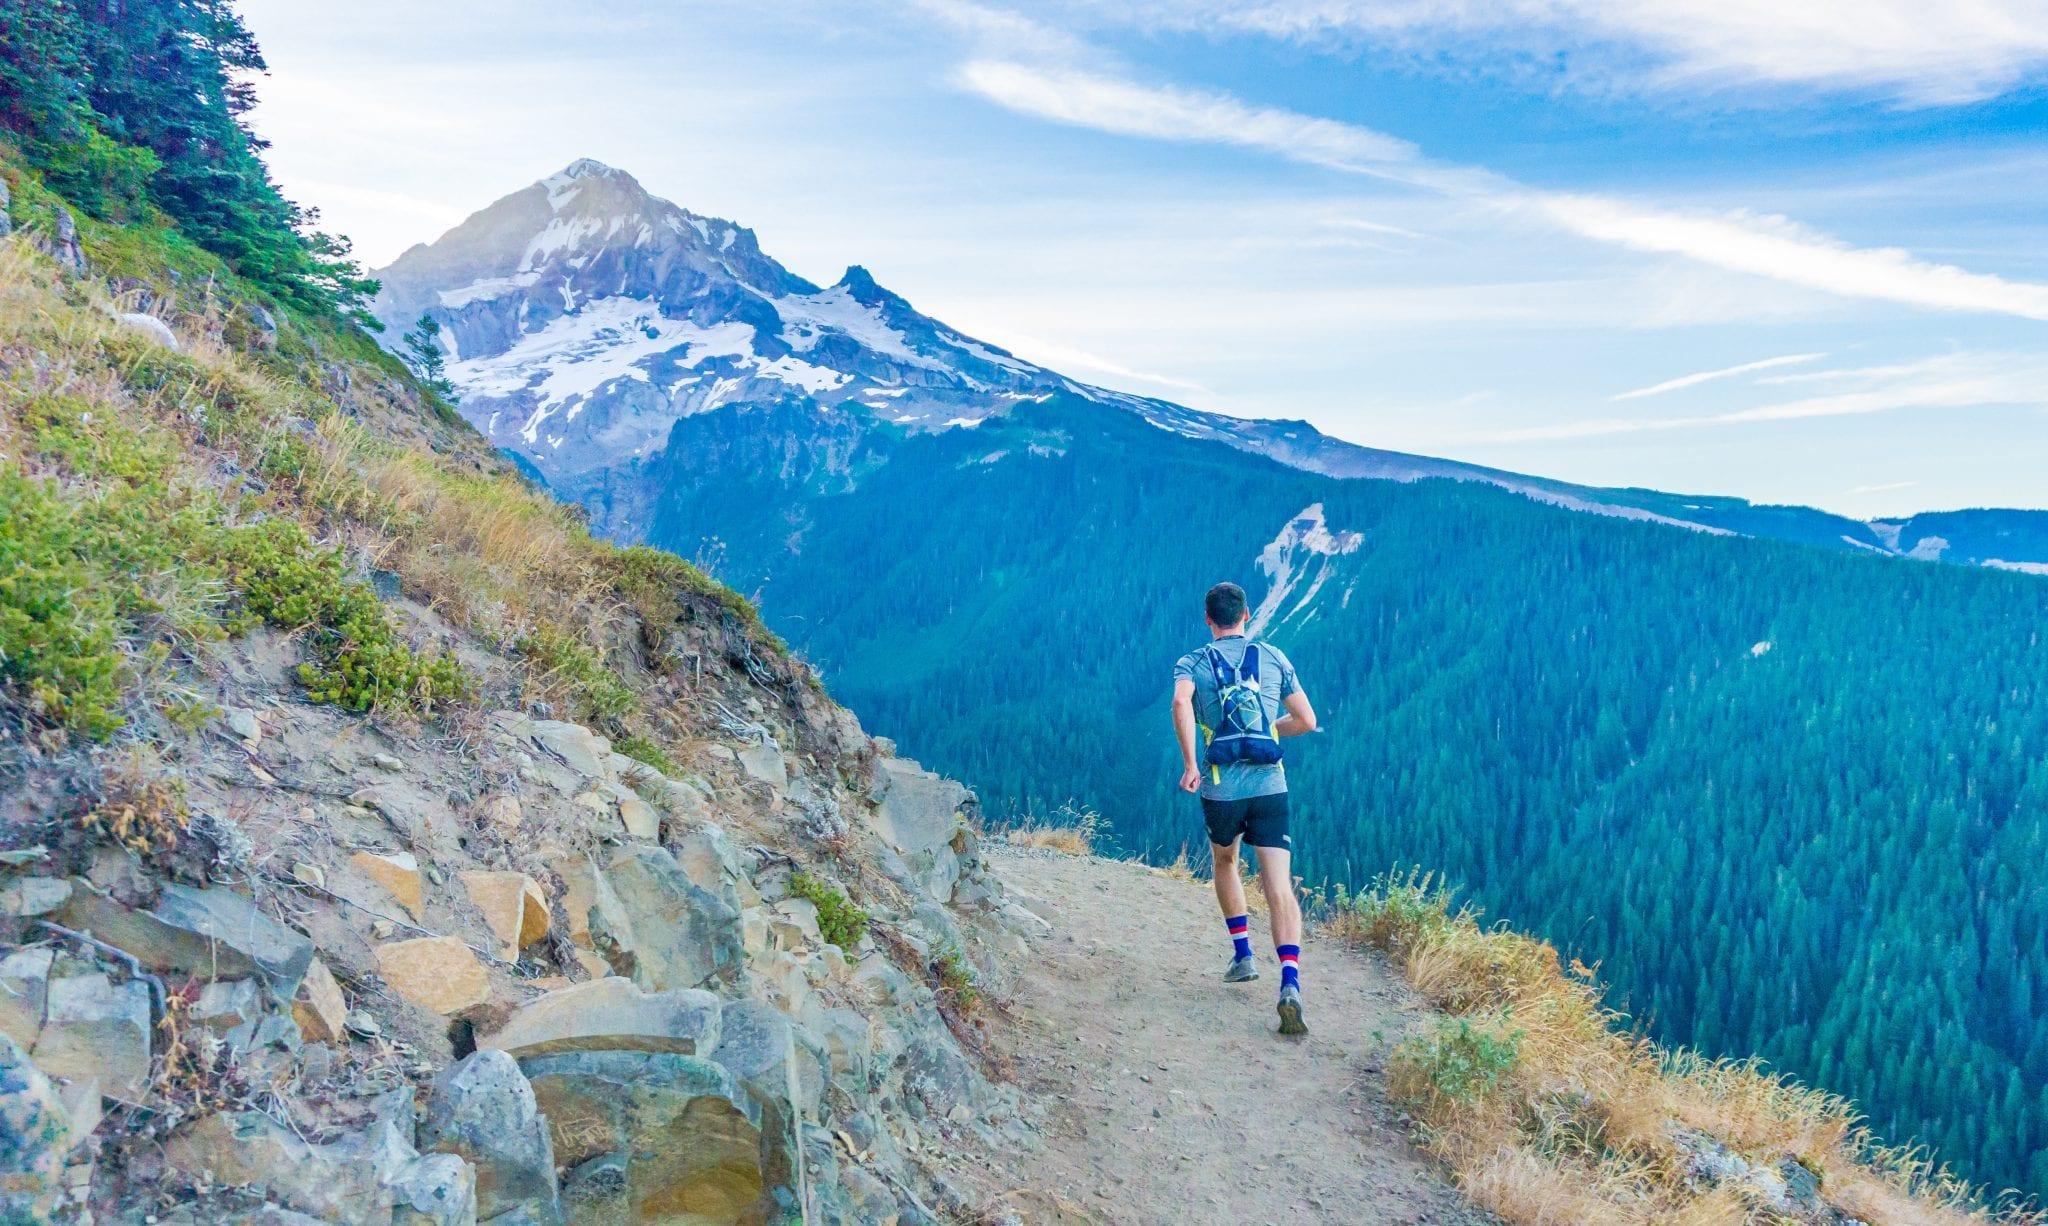 Aminozuren trailrunning